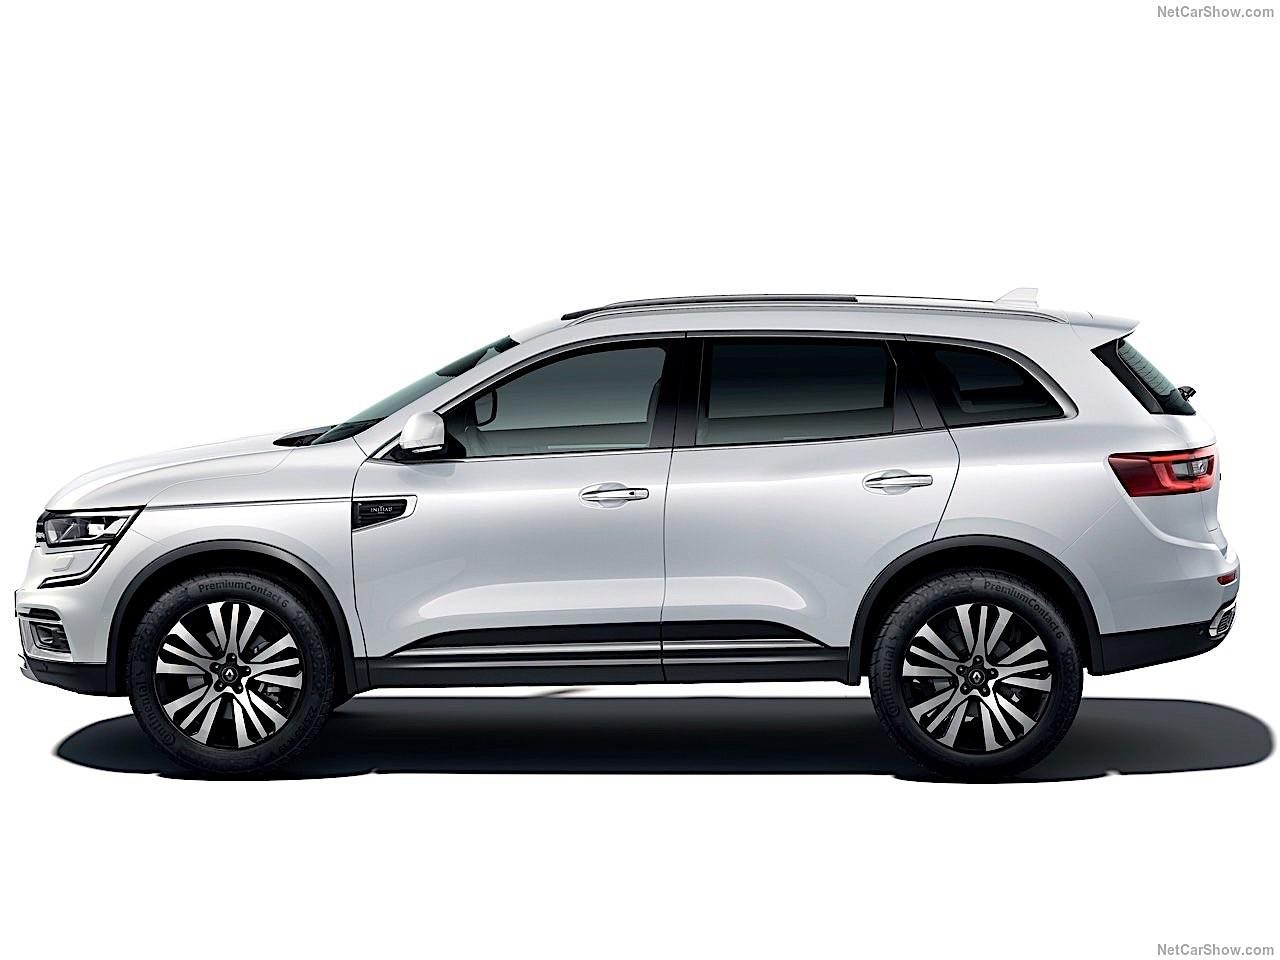 2020 Renault Koleos Facelift Revealed with Visual Upgrades ...